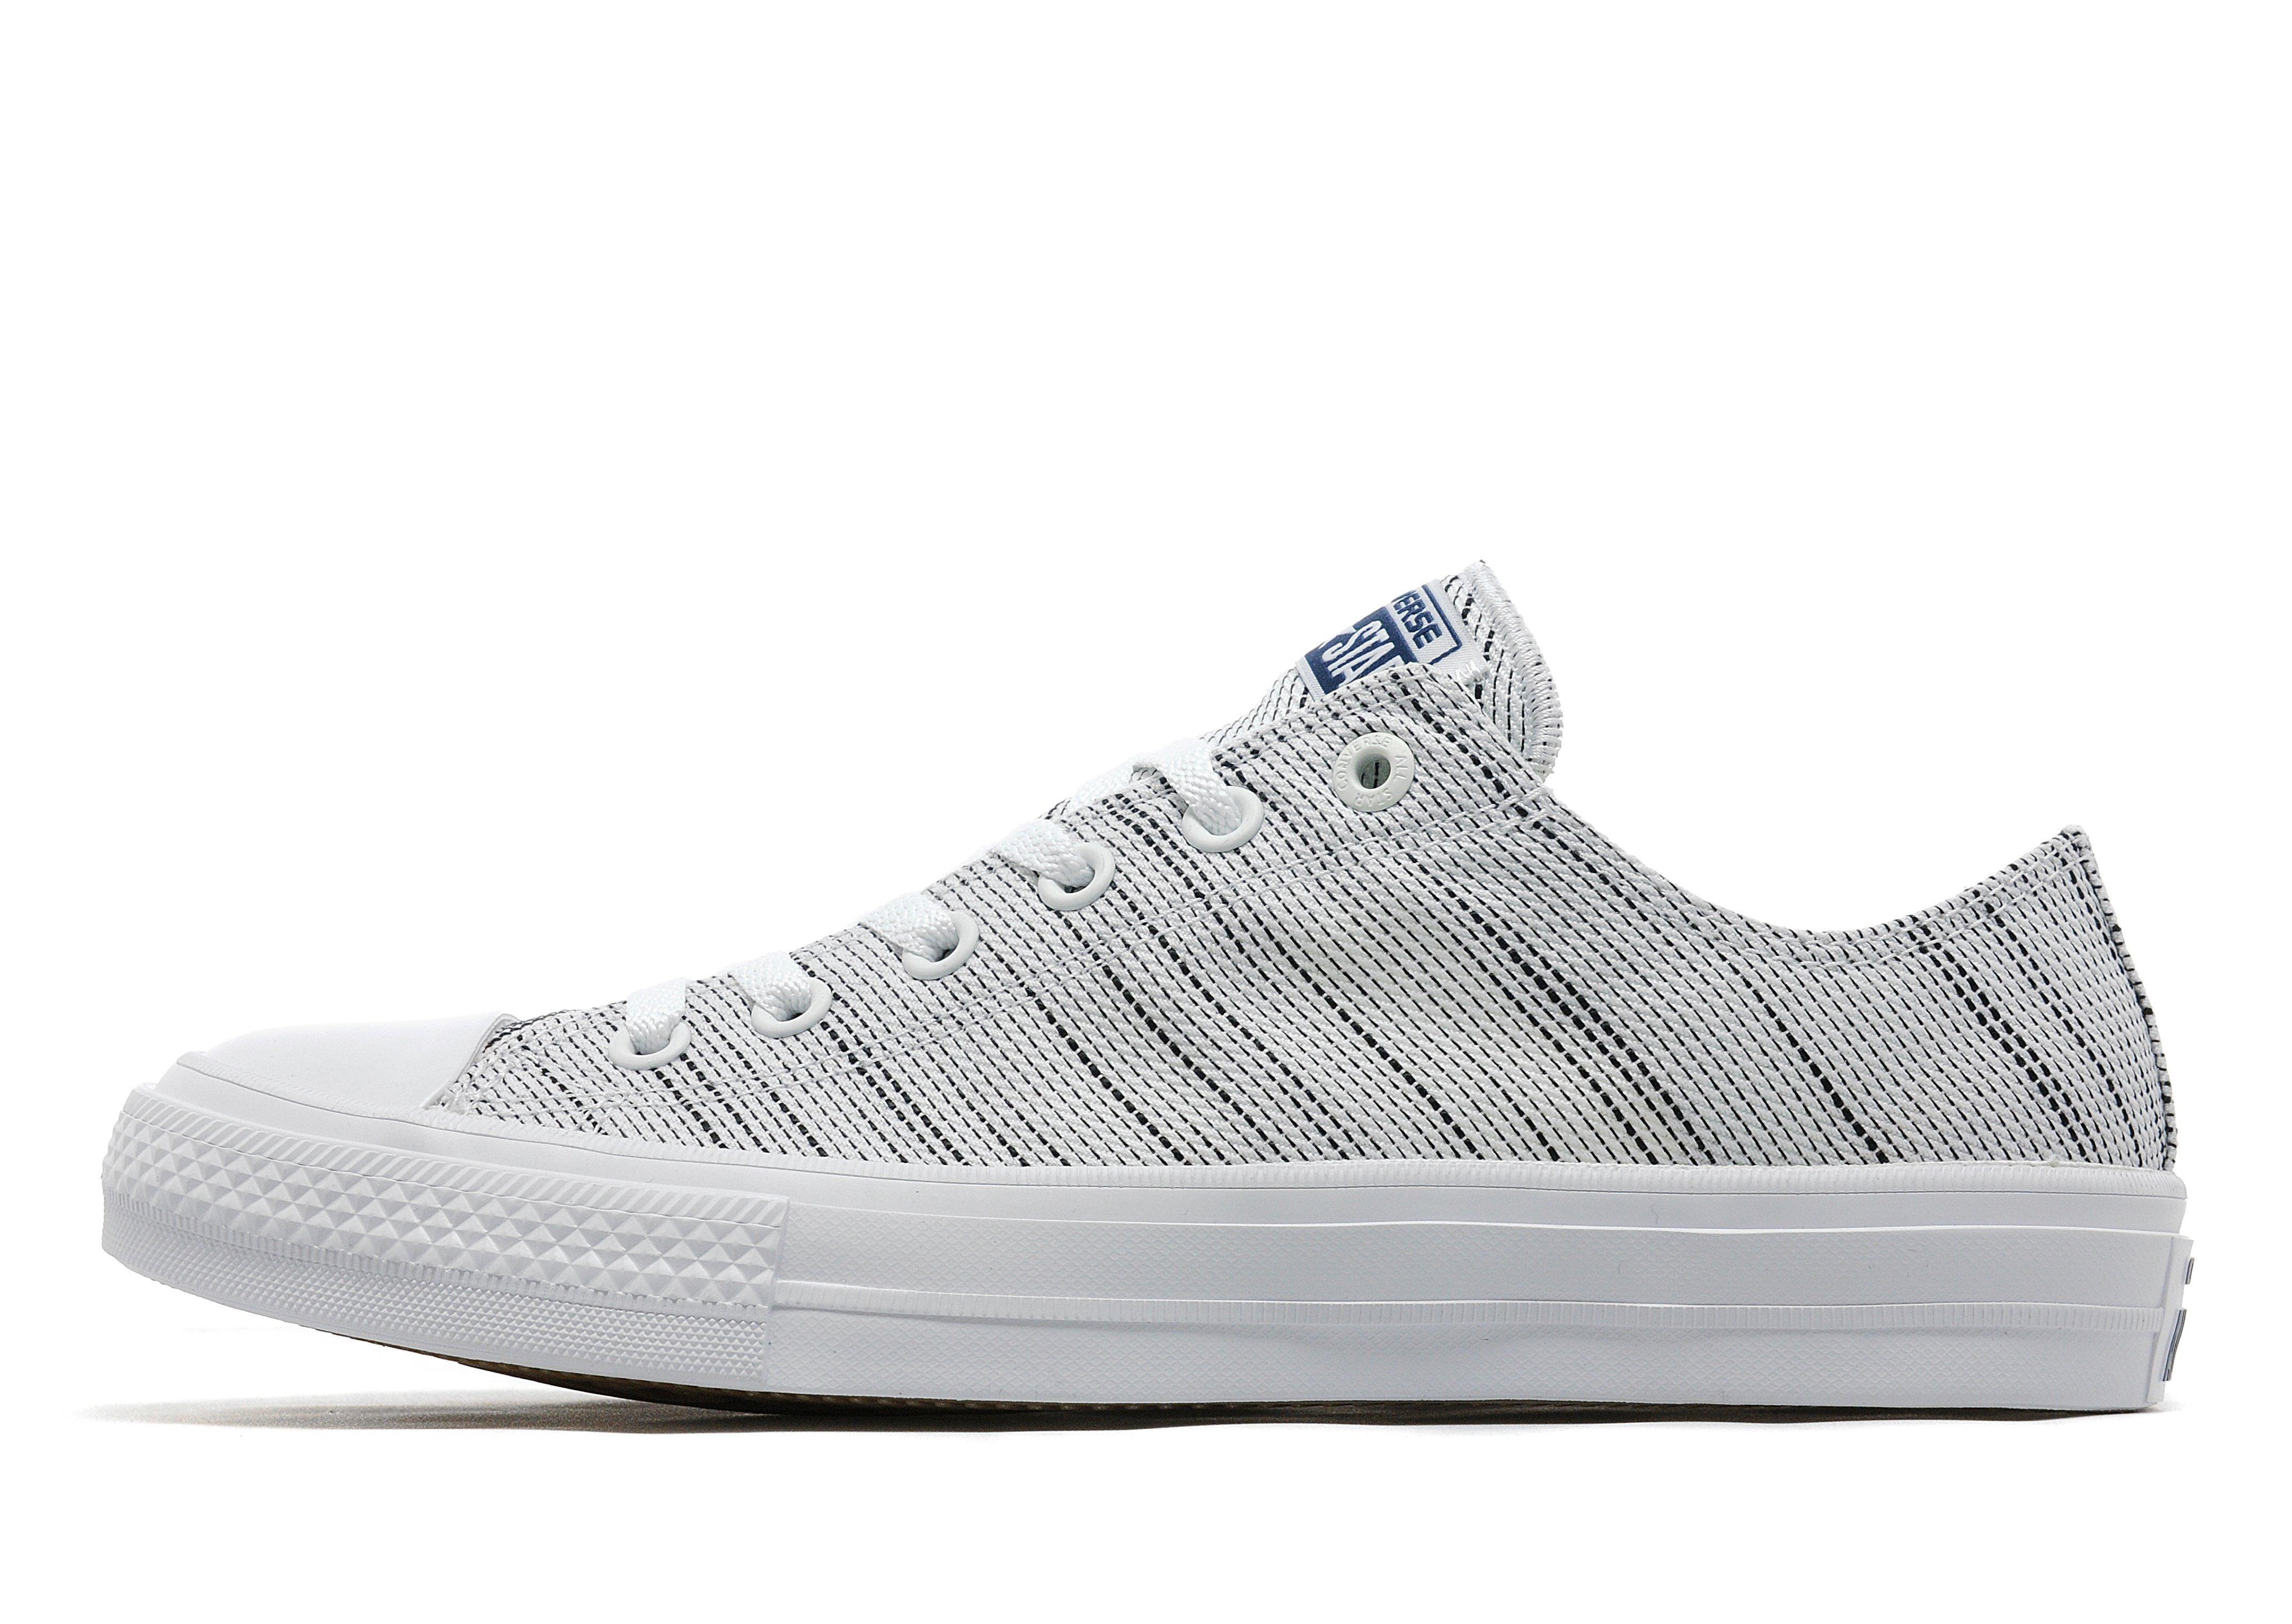 quality design d443f 37a22 adidas all star 2